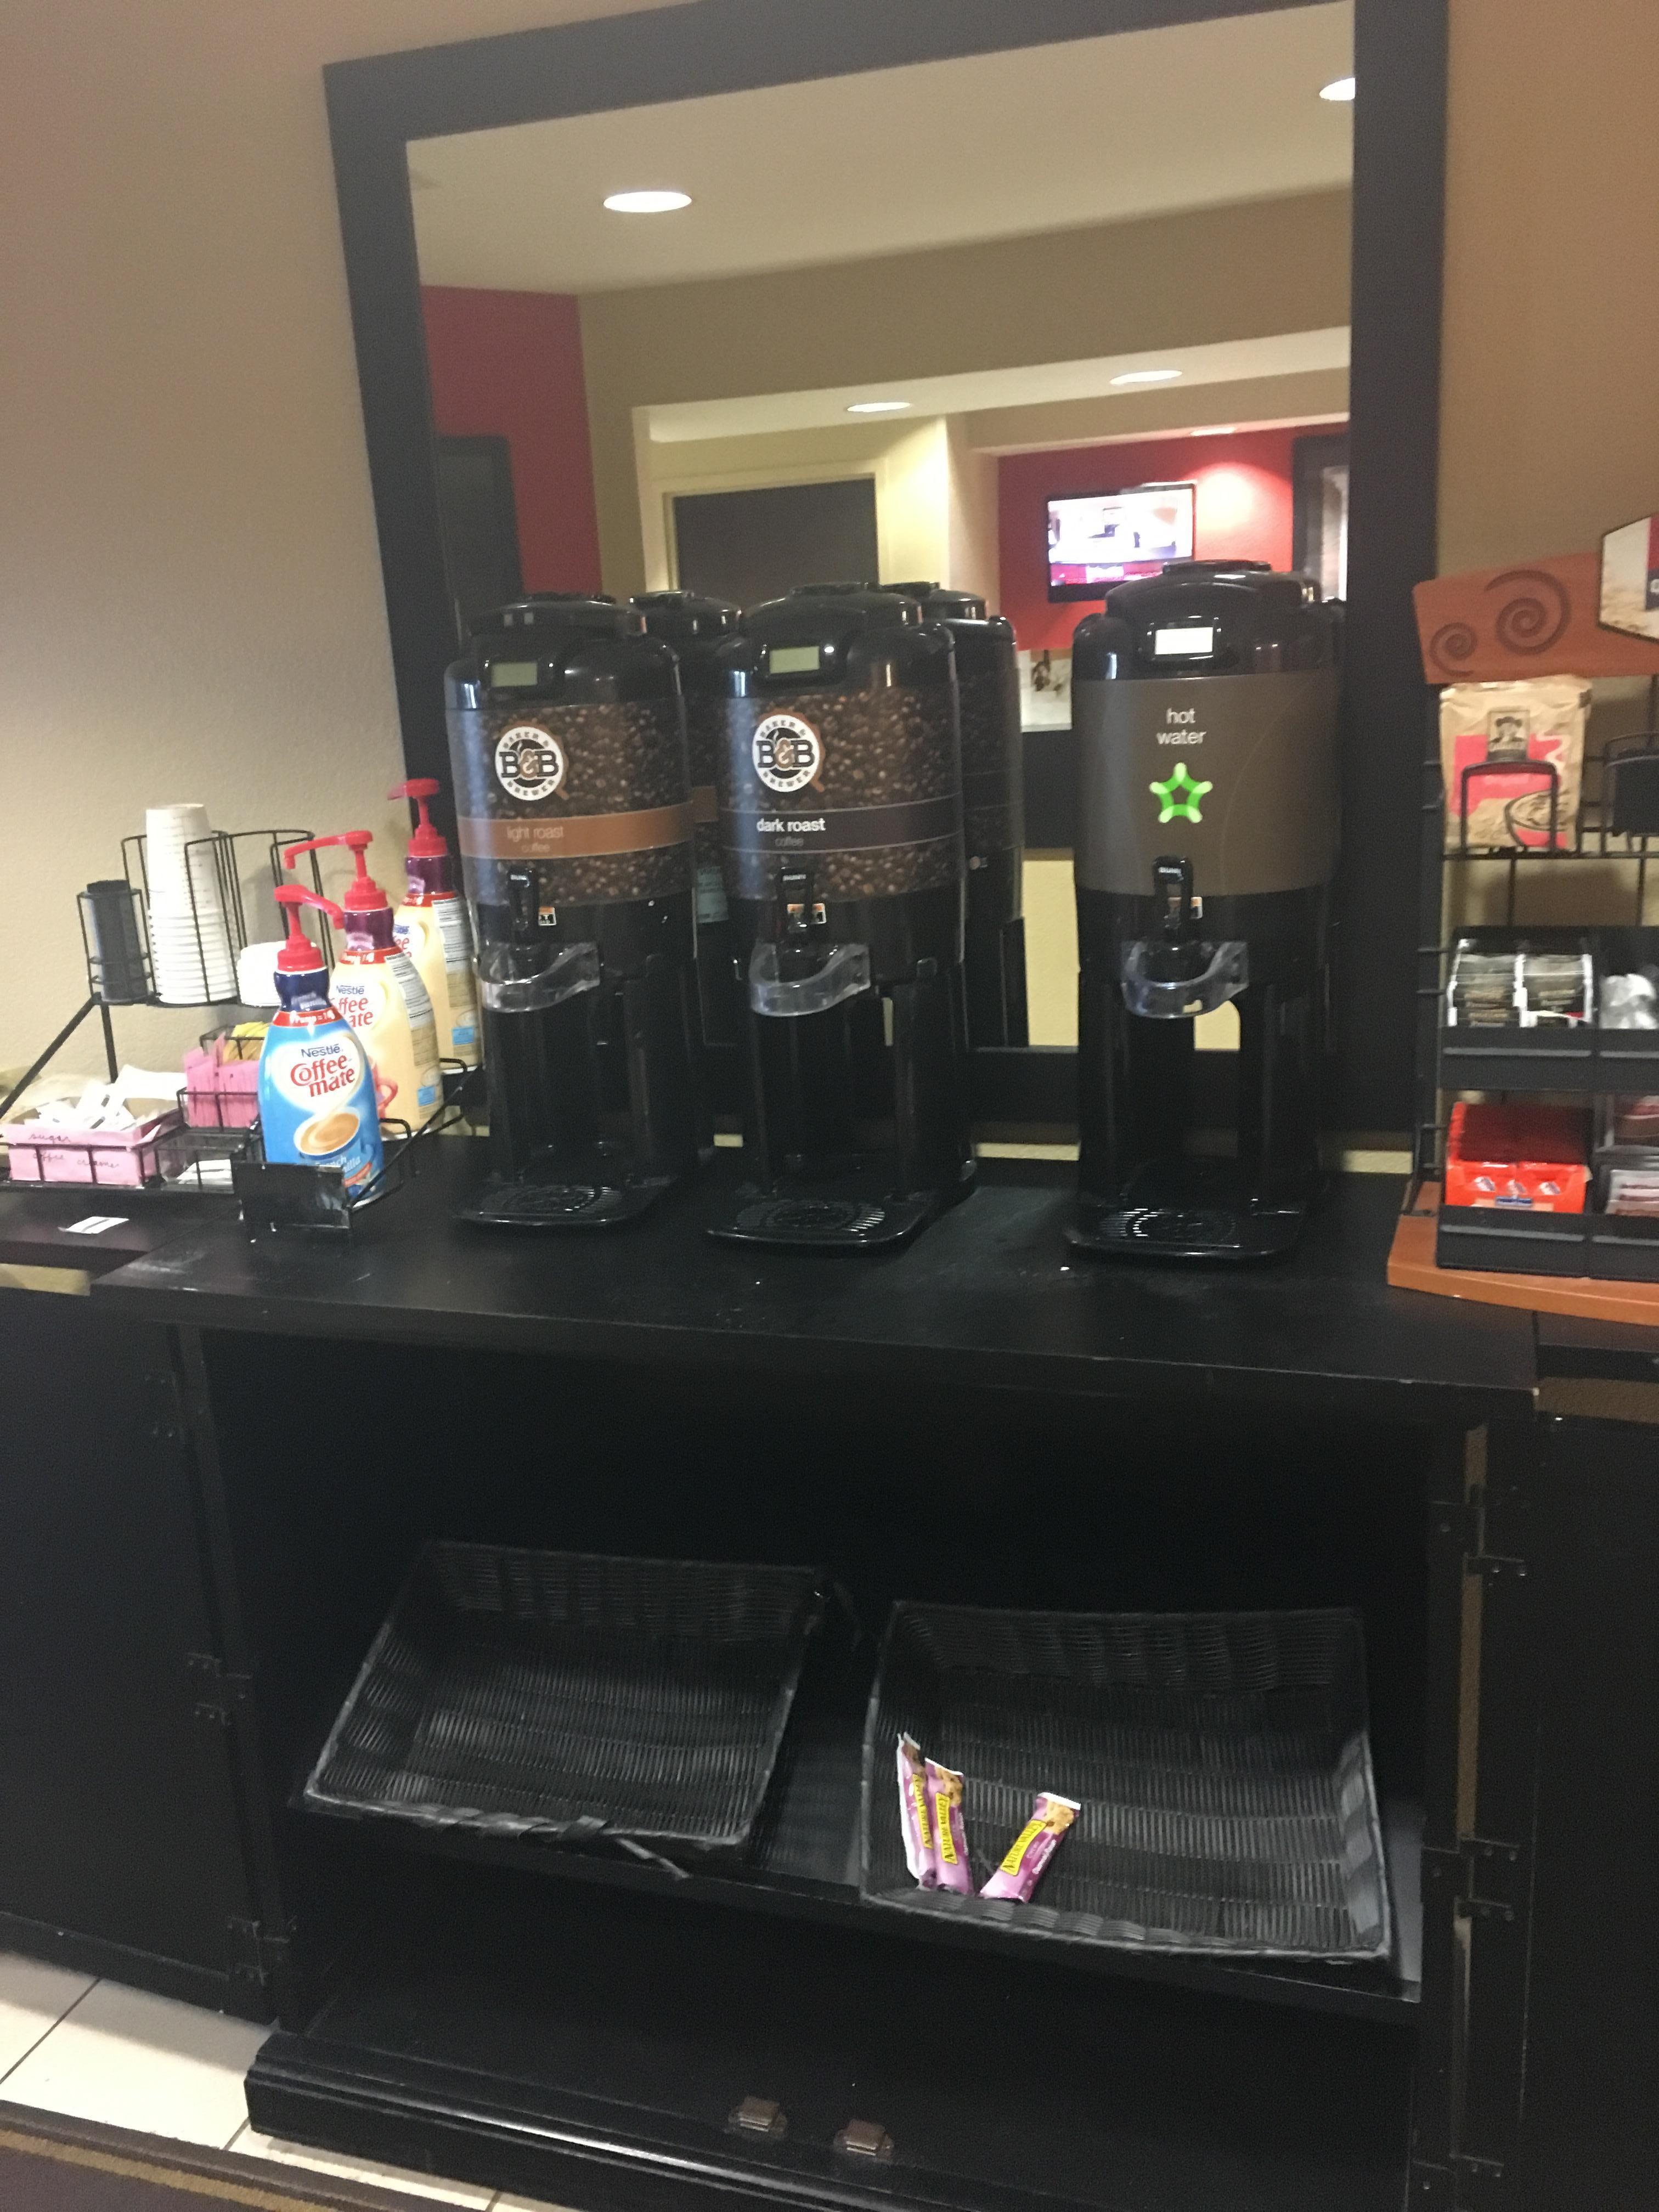 Pathetic breakfast availability